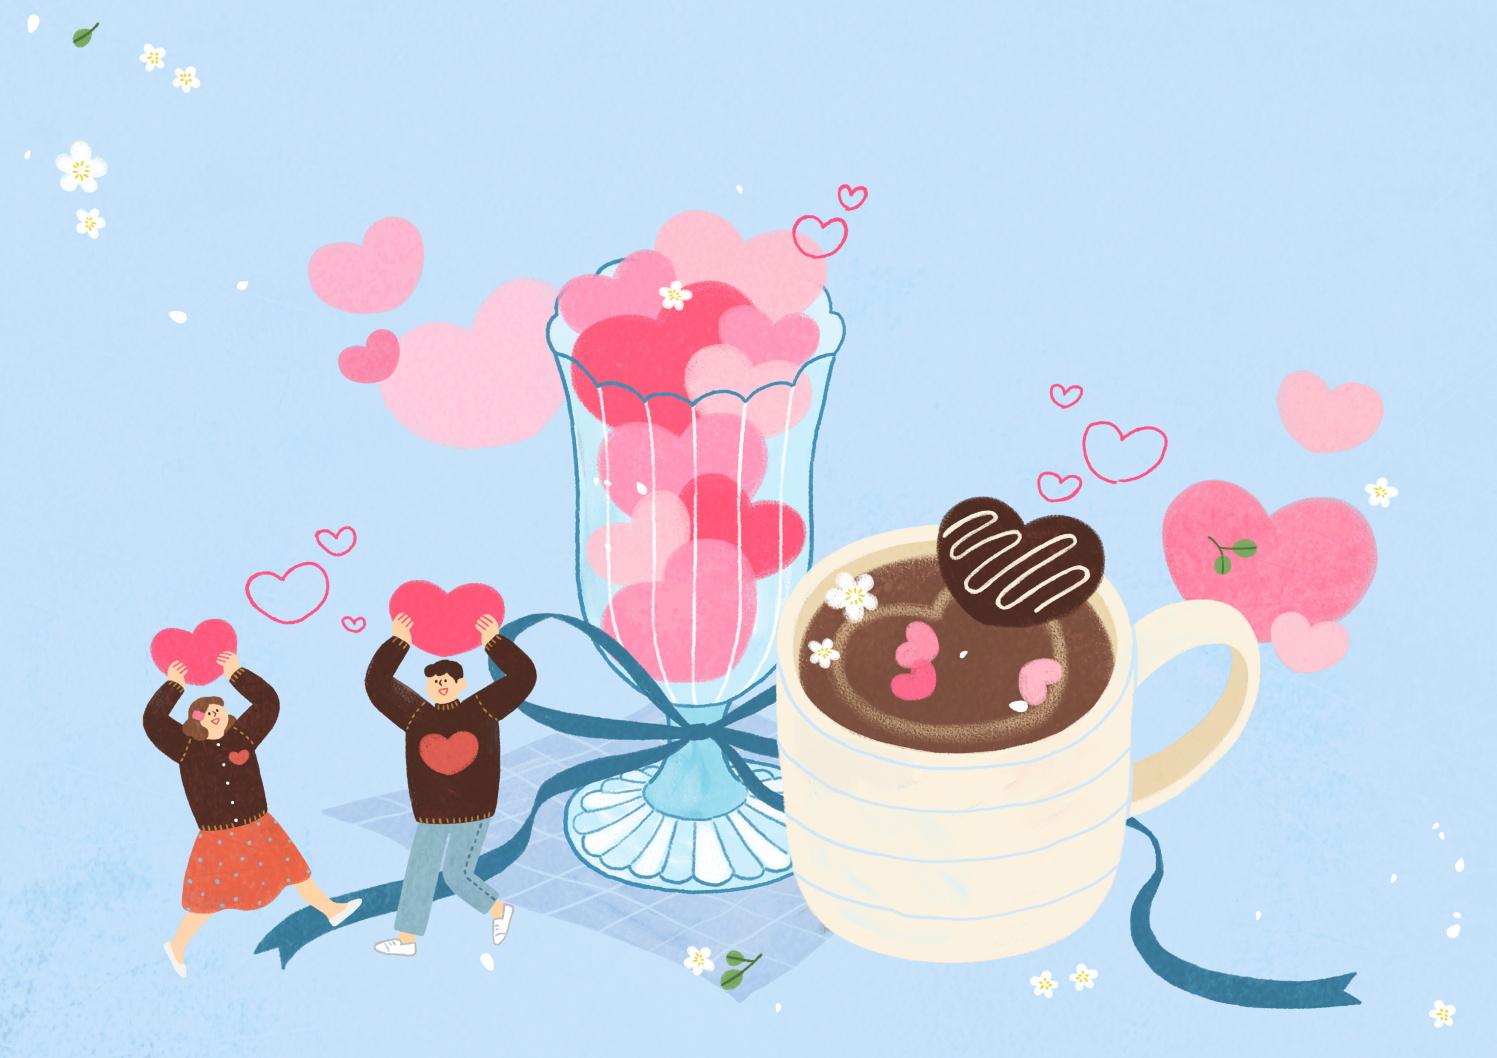 12款情人节七夕情侣手绘插画海报传单设计PSD素材 Valentines Day Couple Hand Drawn Illustration插图4